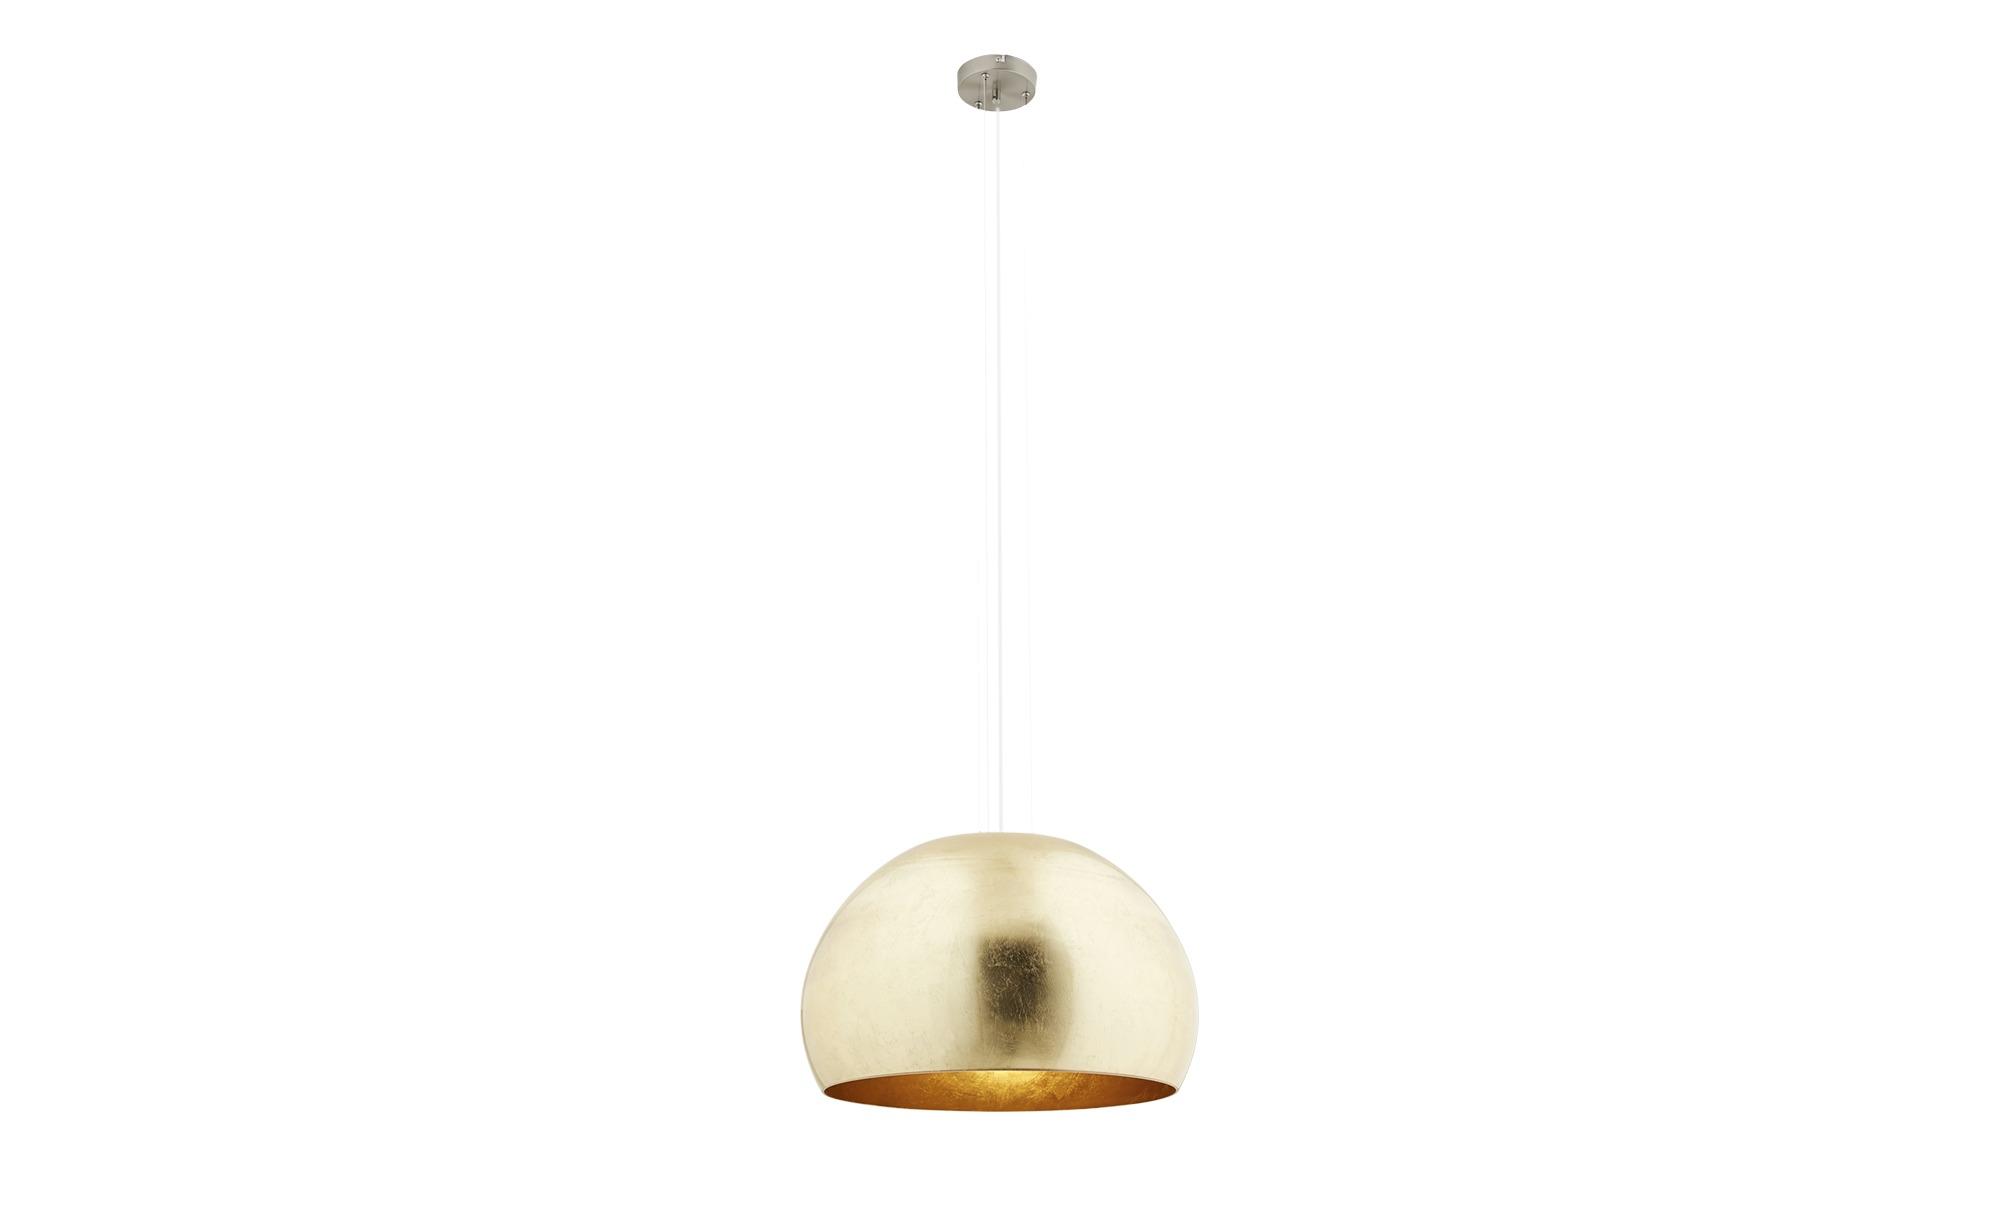 Trio Pendelleuchte, 1-flammig ¦ gold ¦ Maße (cm): H: 155 Ø: [51.0] Lampen & Leuchten > Innenleuchten > Pendelleuchten - Höffner